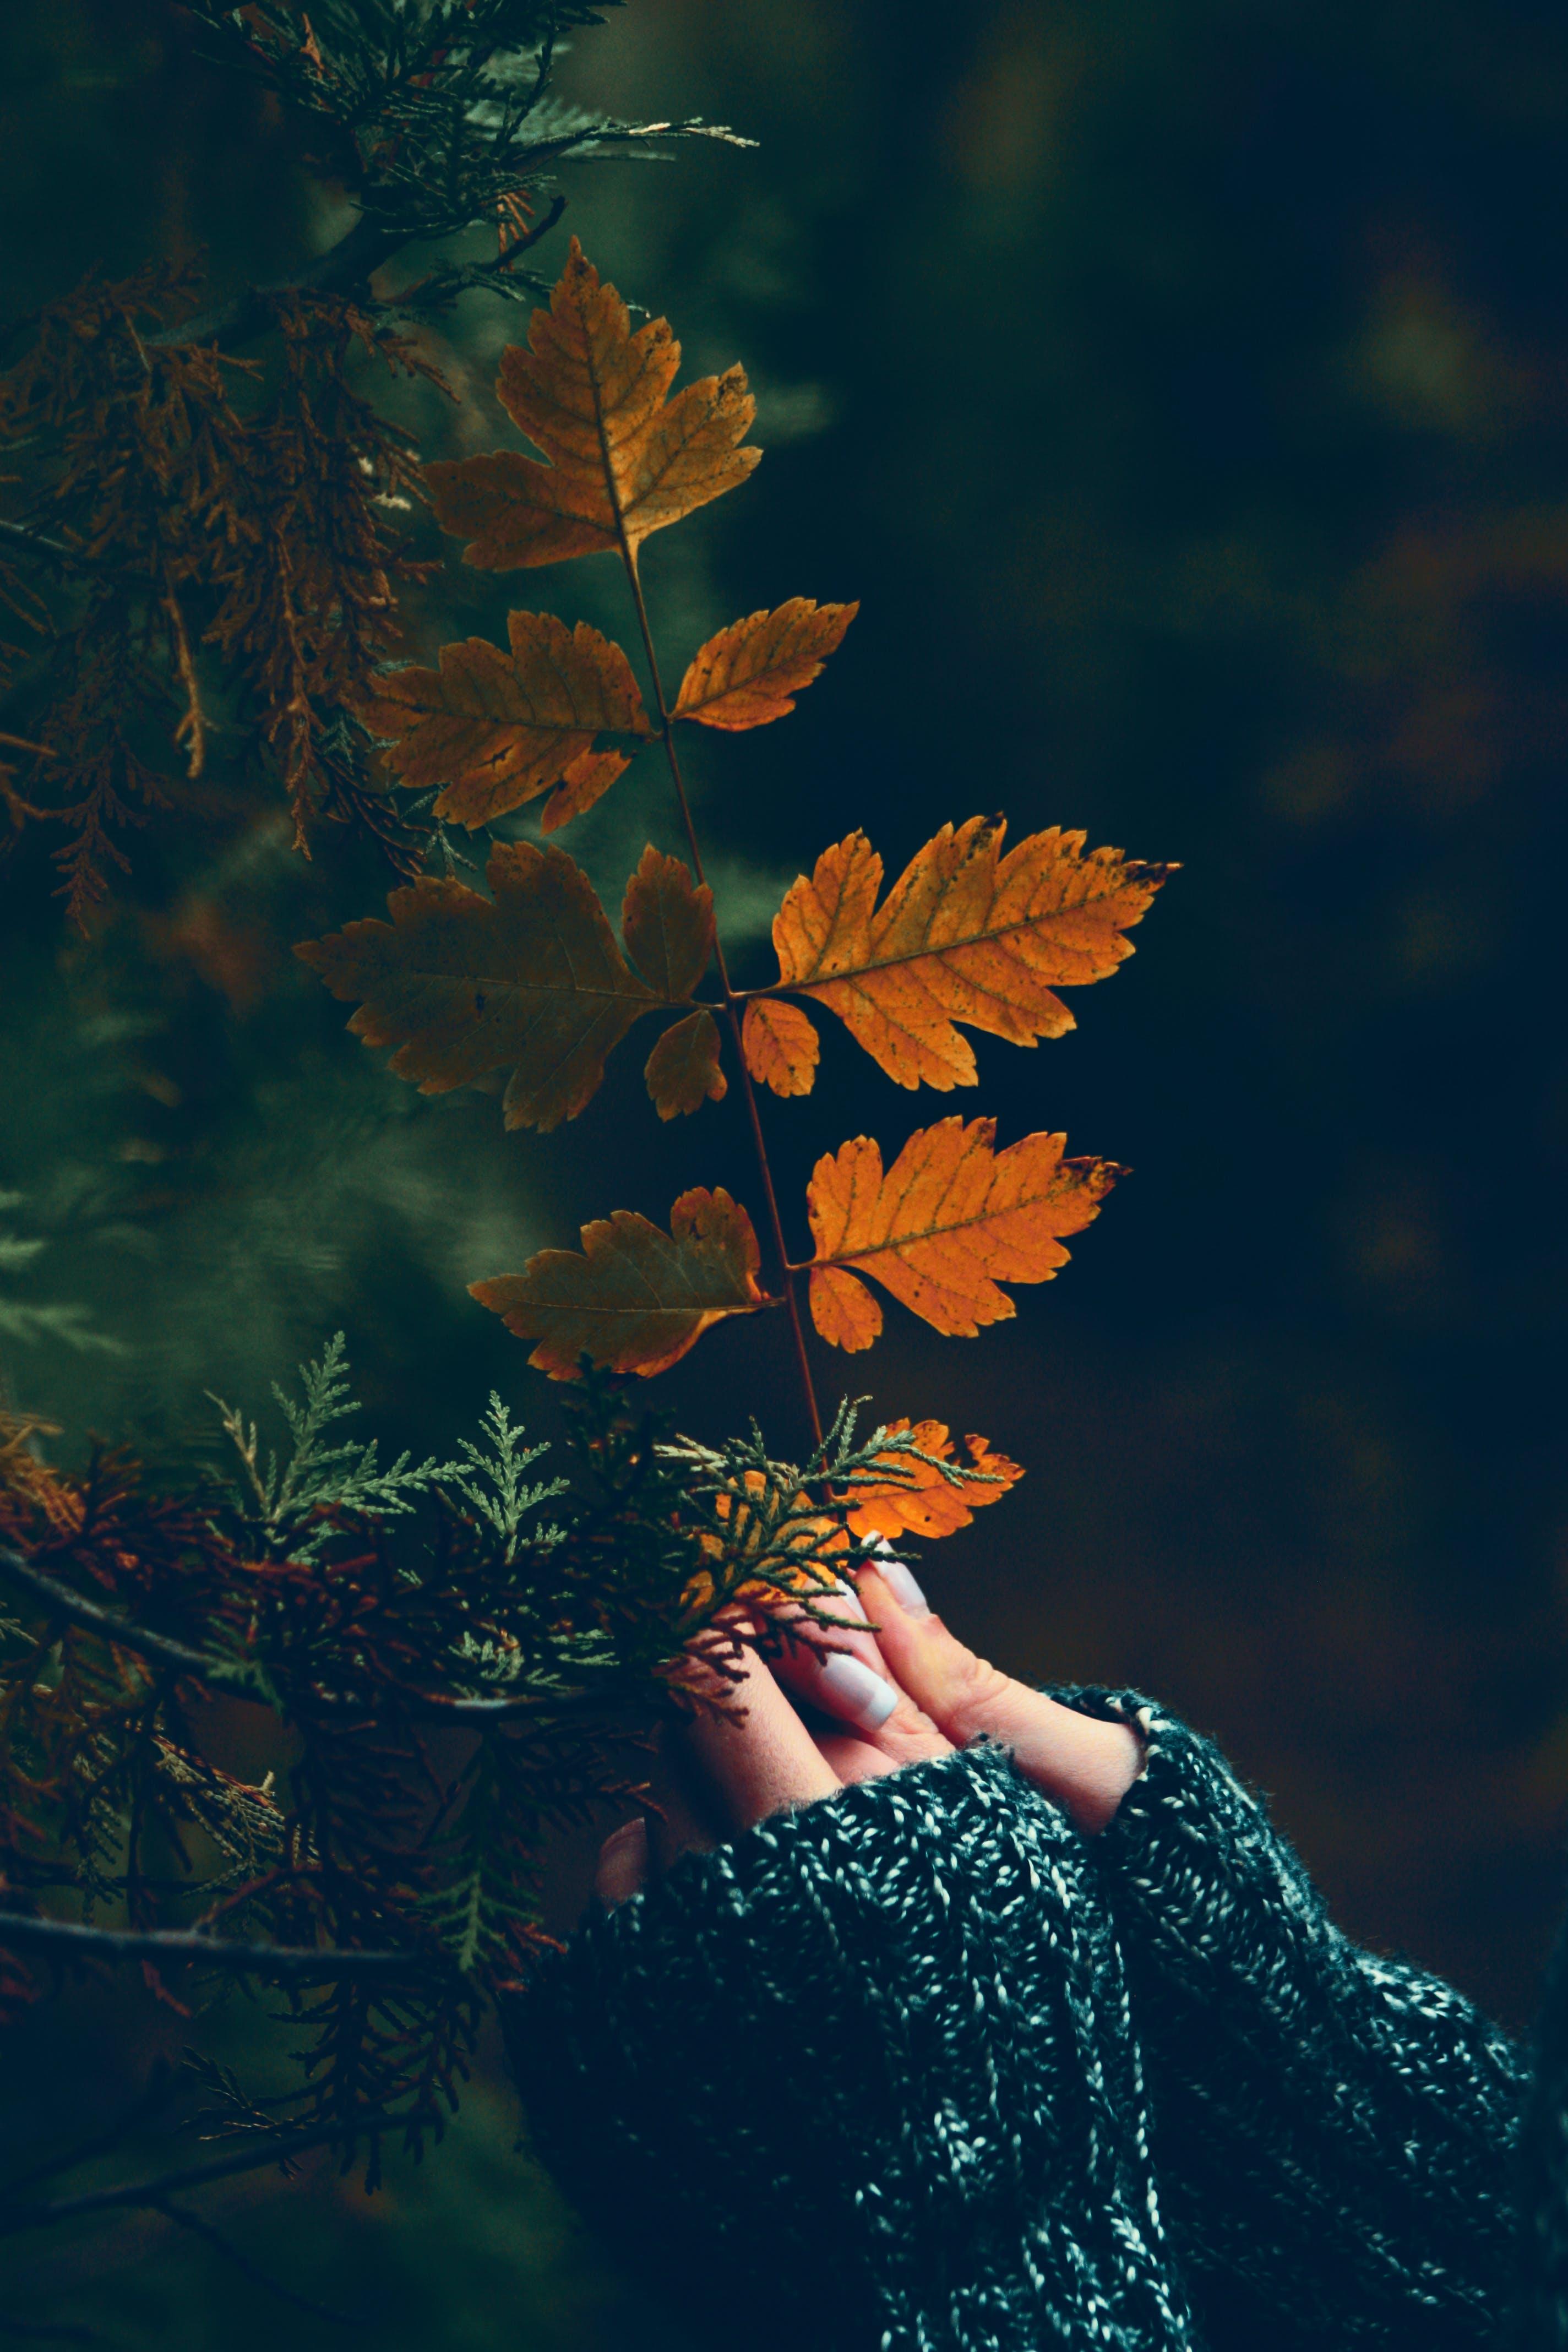 Person Holding Brown Bipinnate Leaves